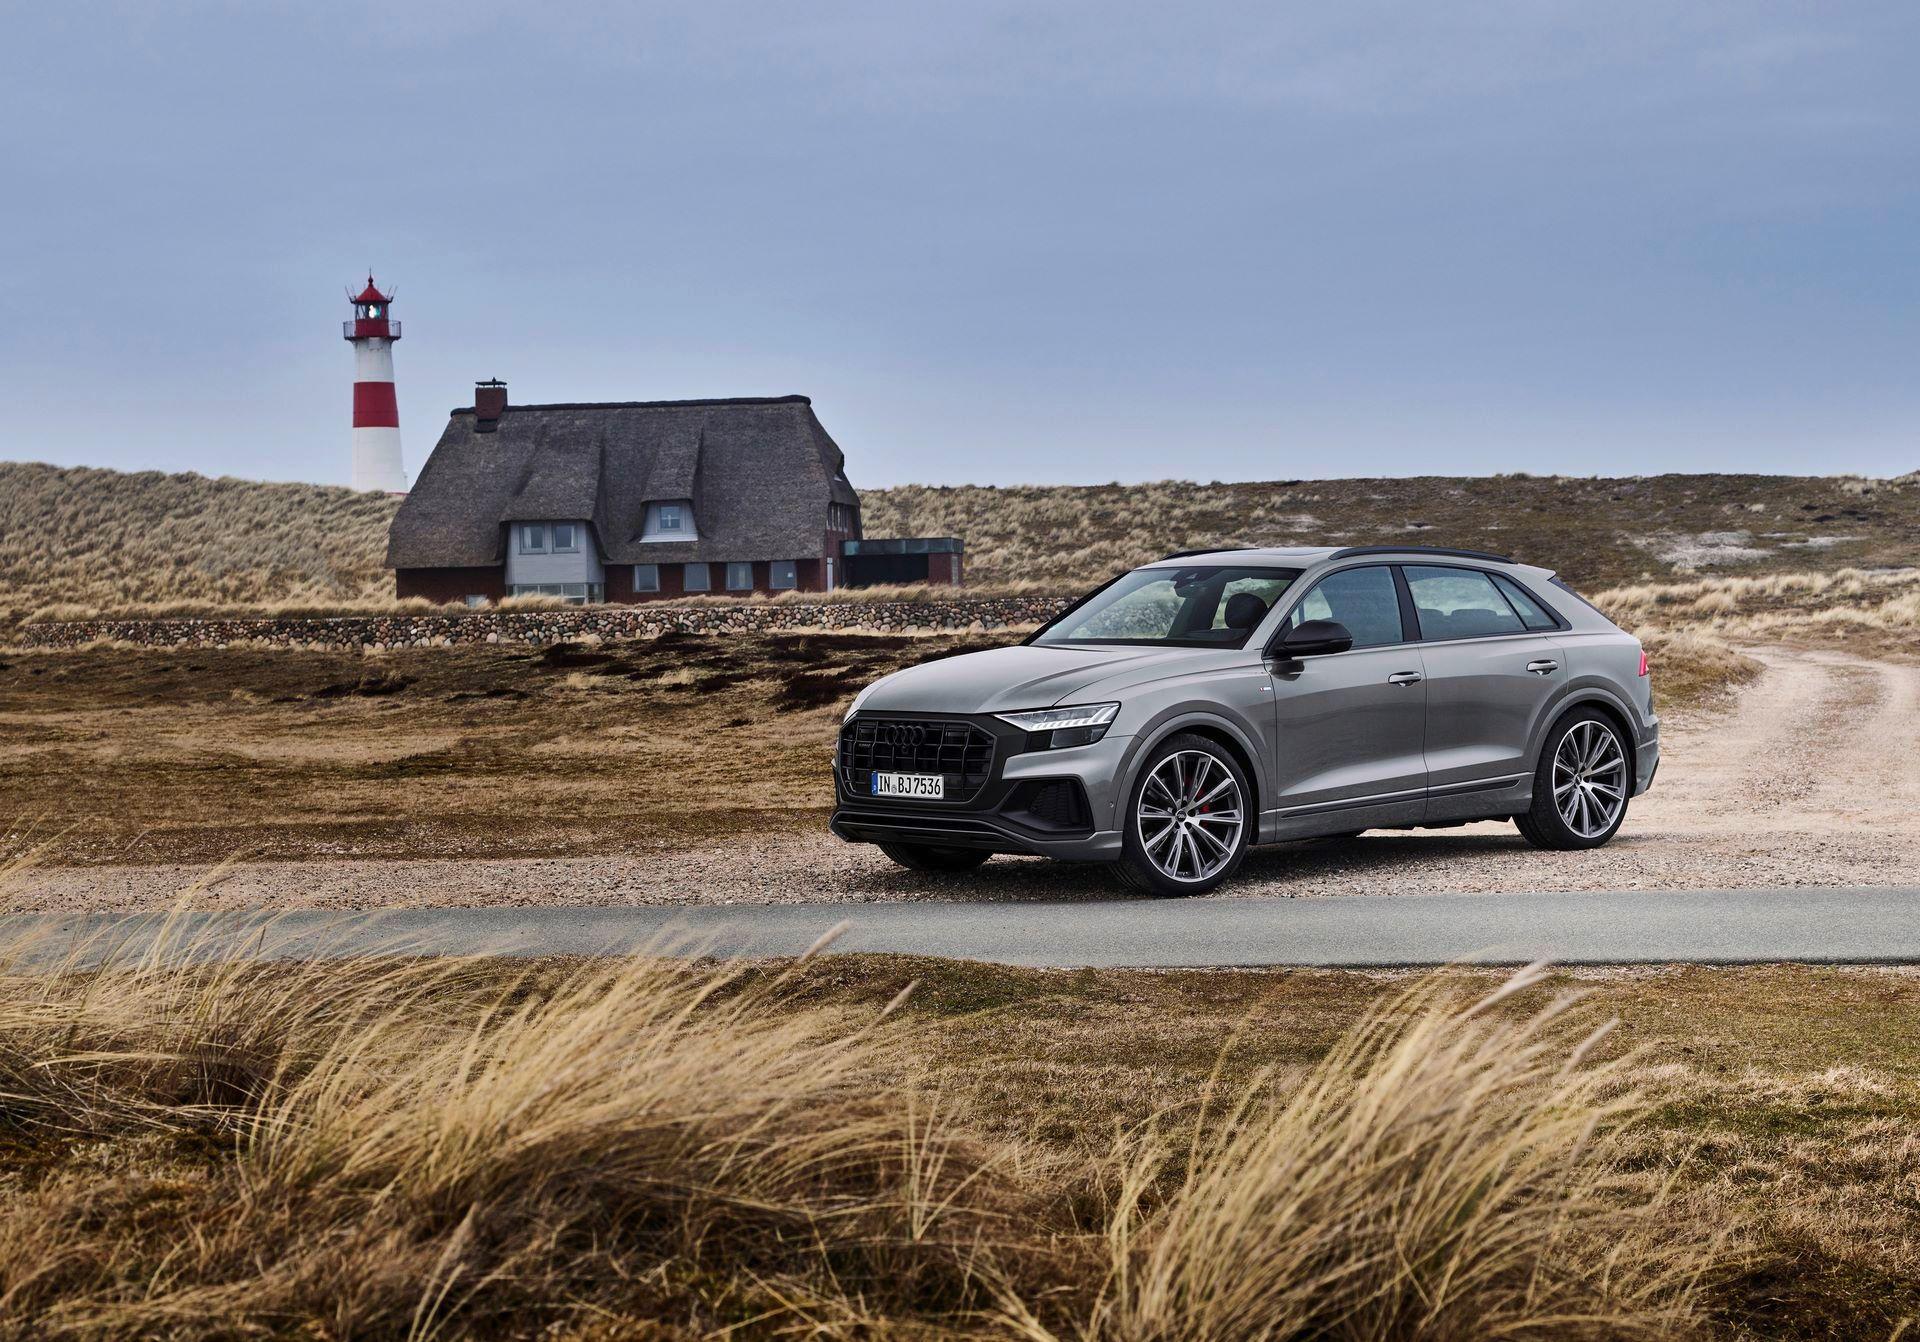 Audi-A4-A5-Q7-Q8-Competition-And-Competition-Plus-Trims-23